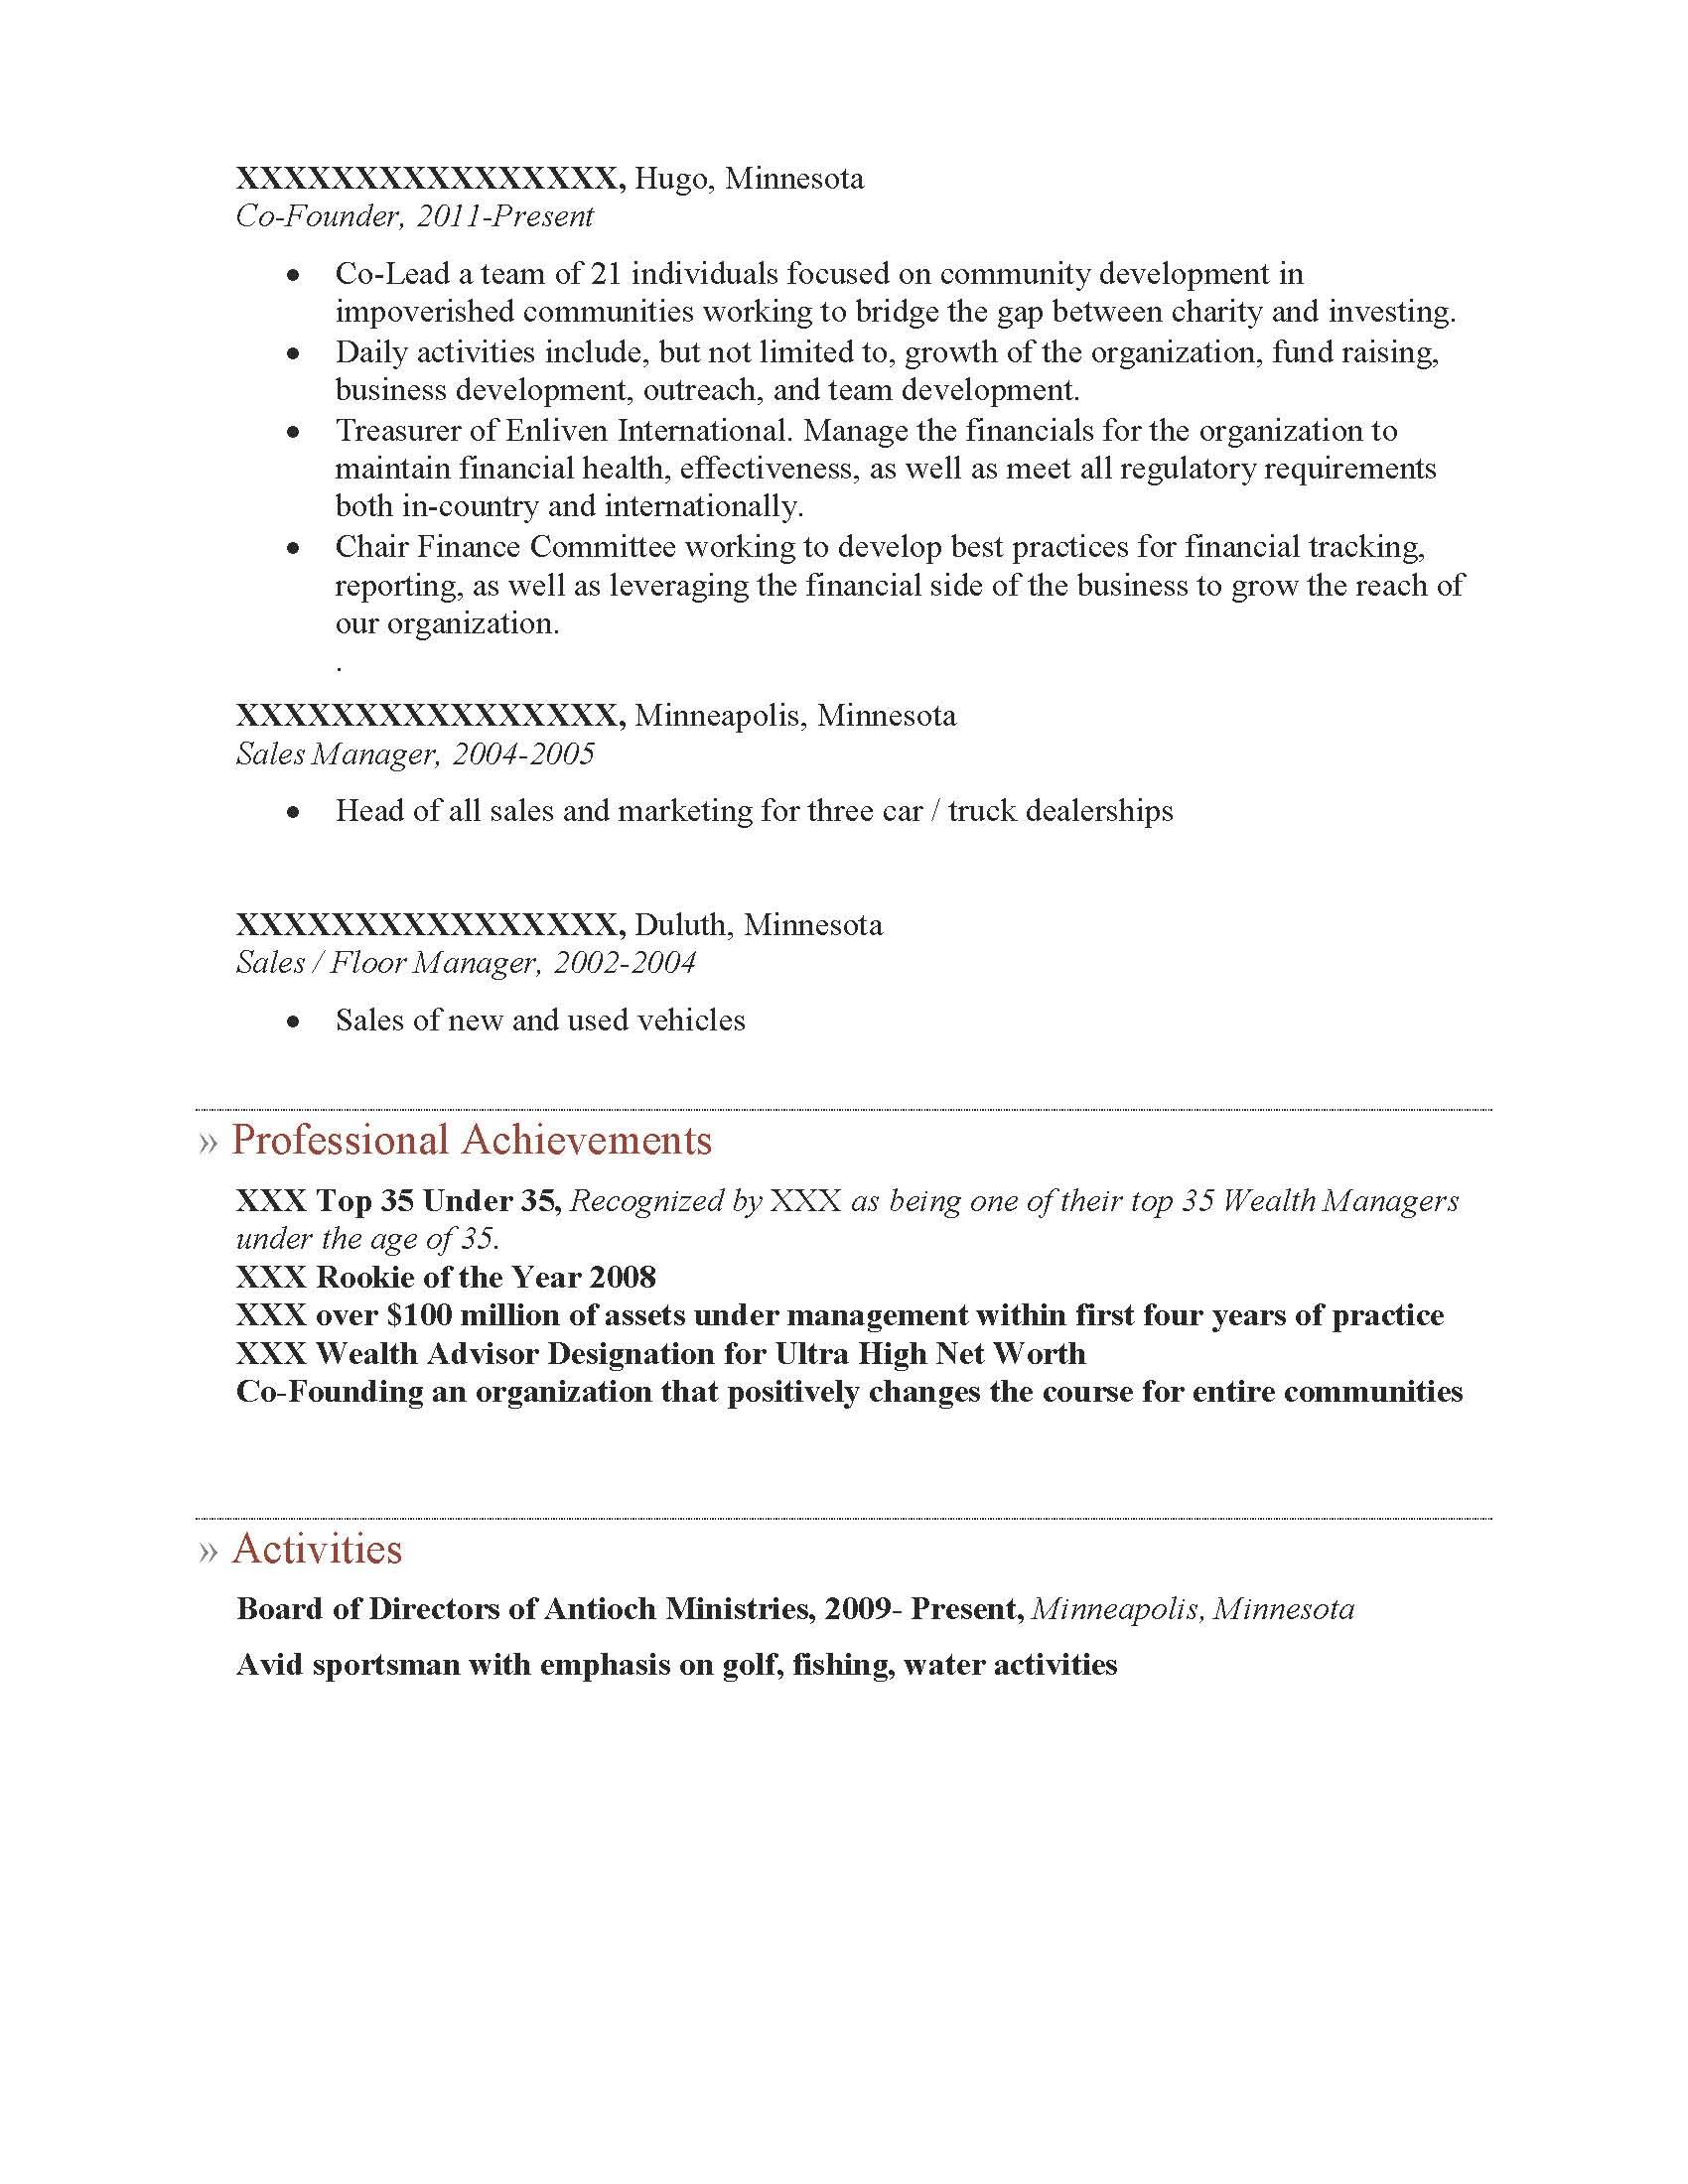 Executive MBA Weekend Program Resume Sample - Before-2